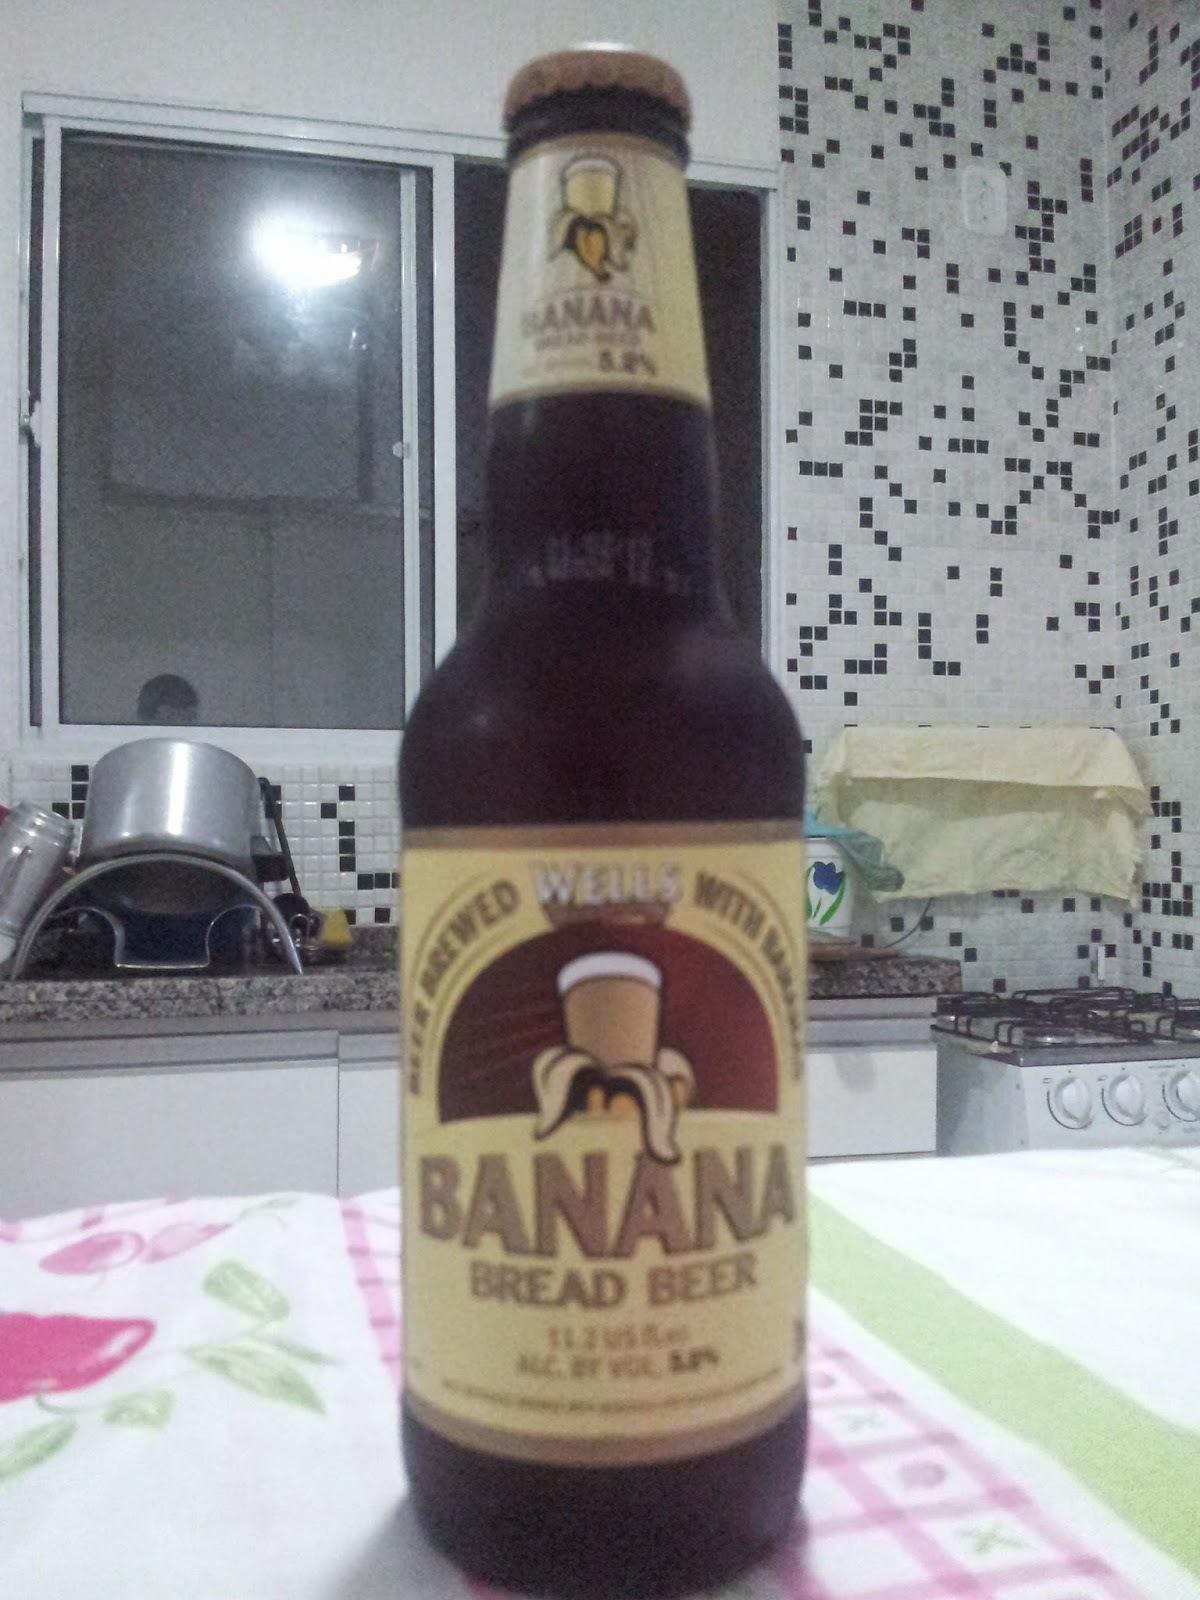 NOVA DEGUSTAÇÃO - CERVEJA WELLS BANANA BREAD BEER